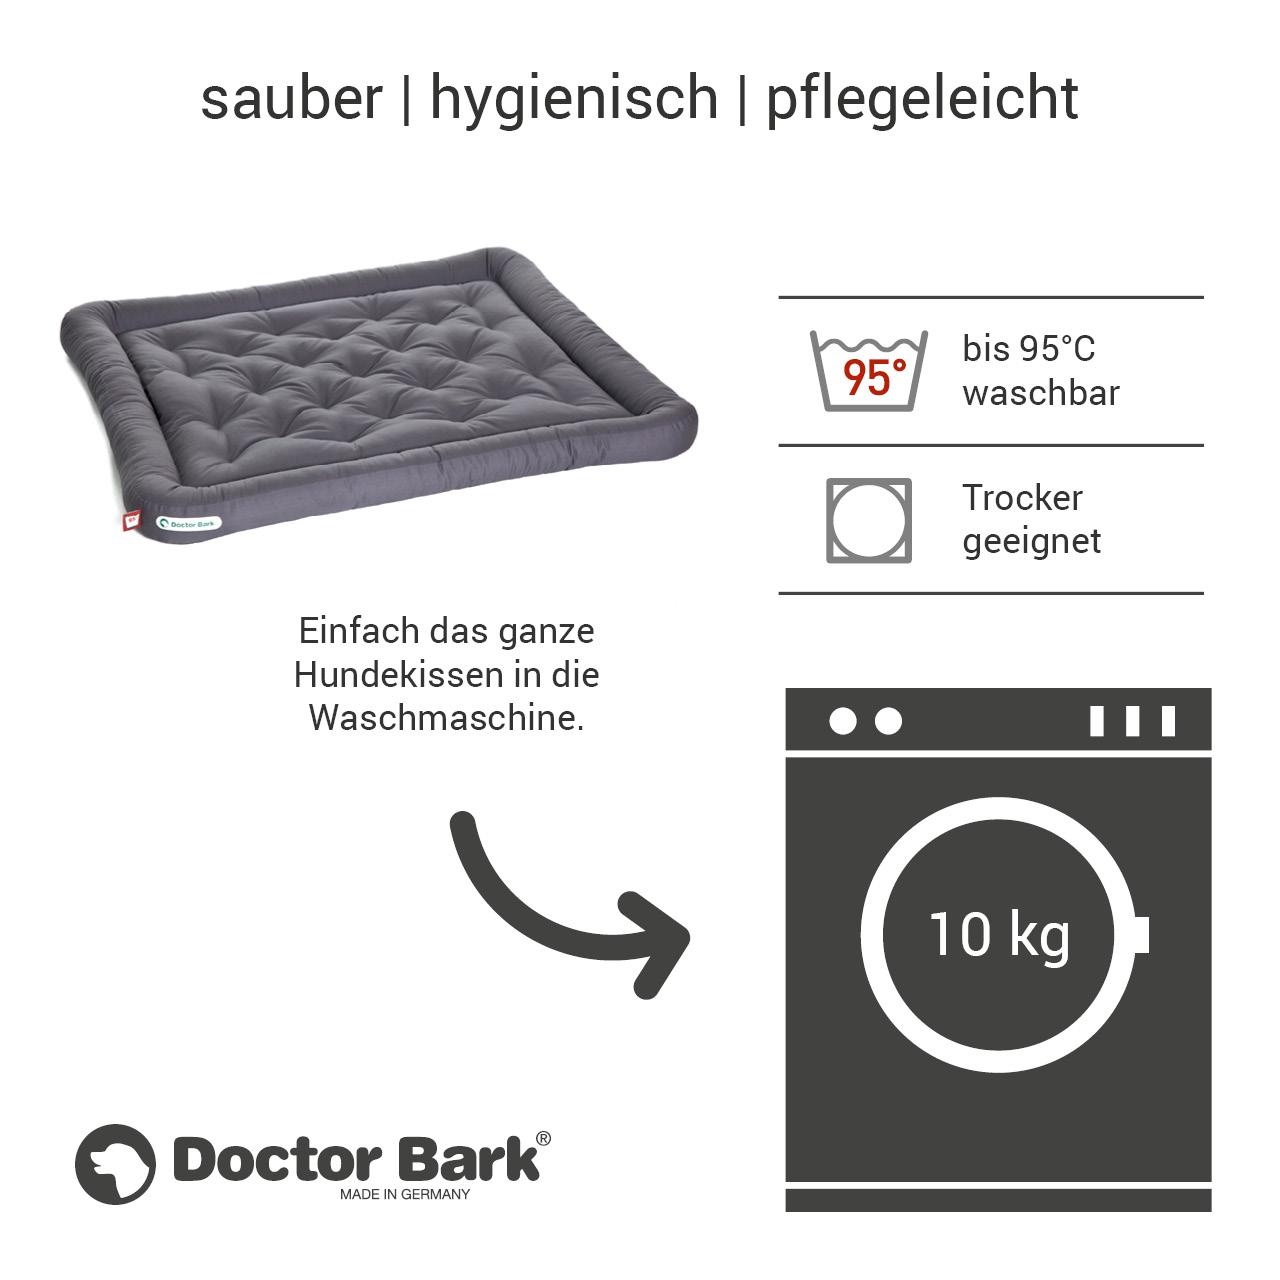 Lounge-Hundekissen / Hundebett orthopädisch Doctor Bark waschbar grau - Gr. XXL